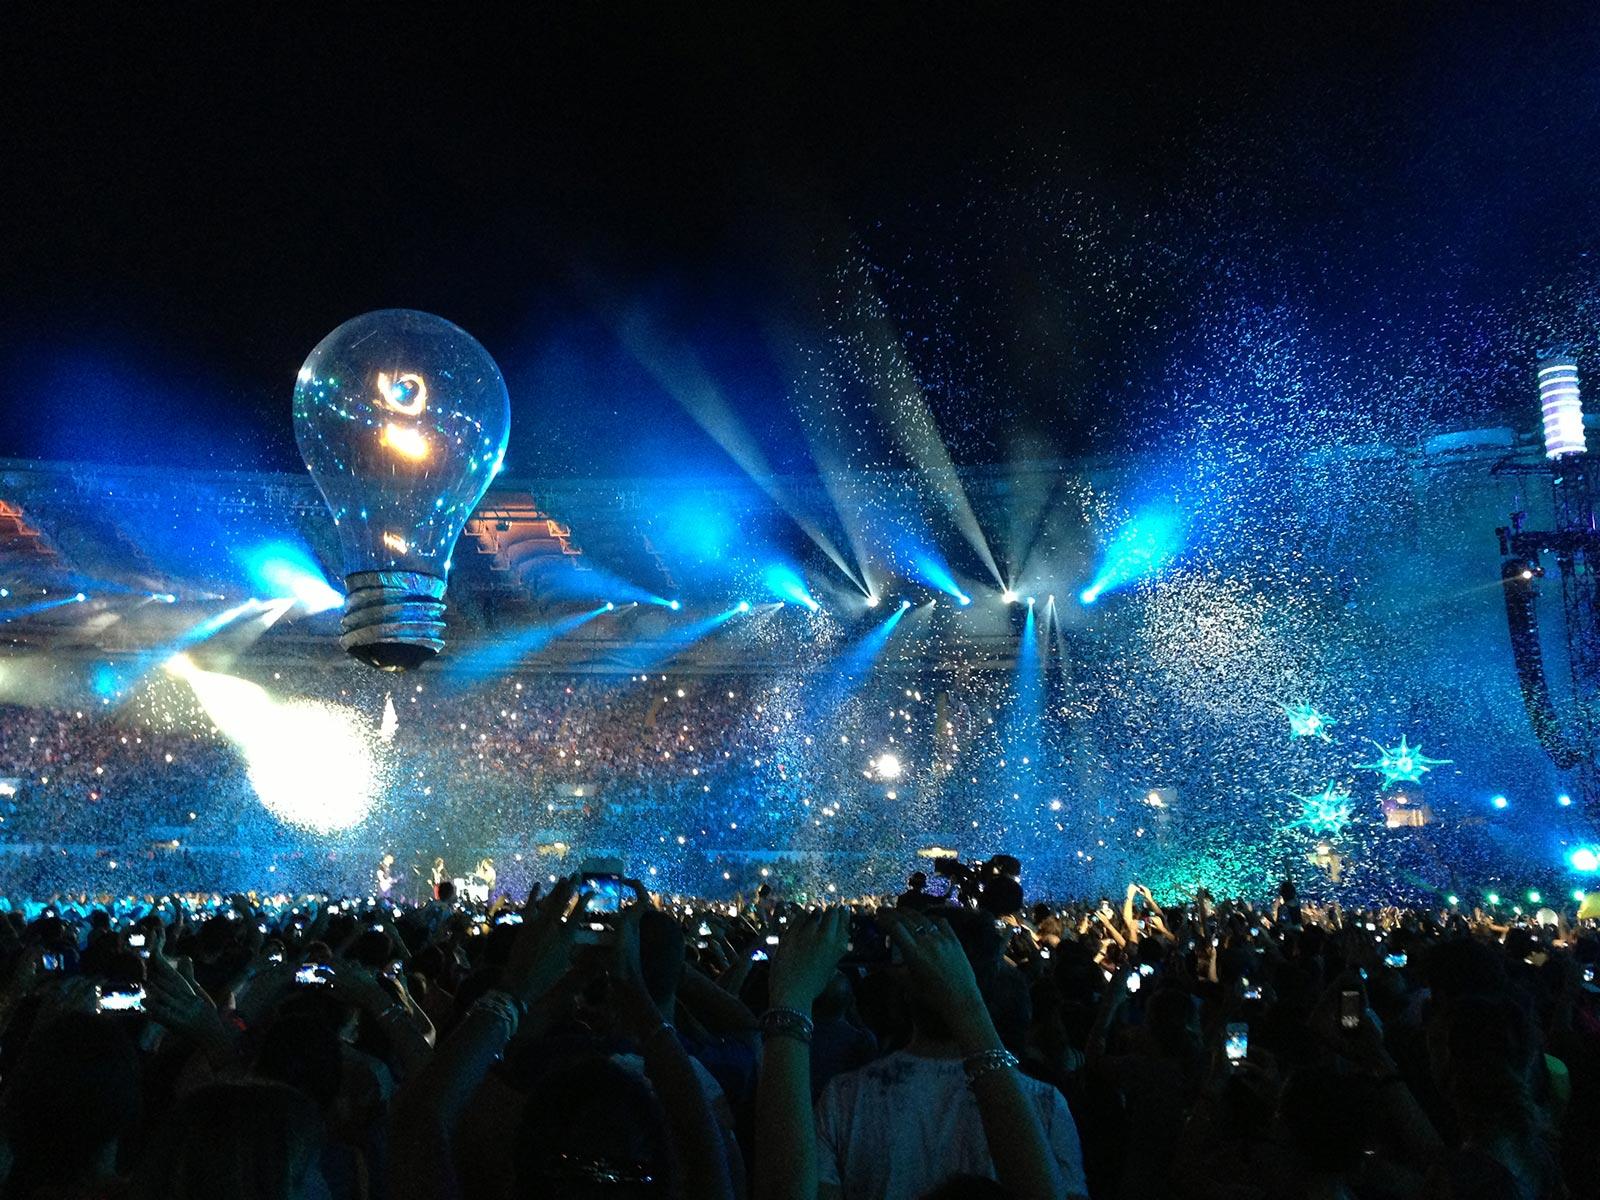 Cirque Bijou - A giant lightbulb flies over crowds at Muse stadium tour